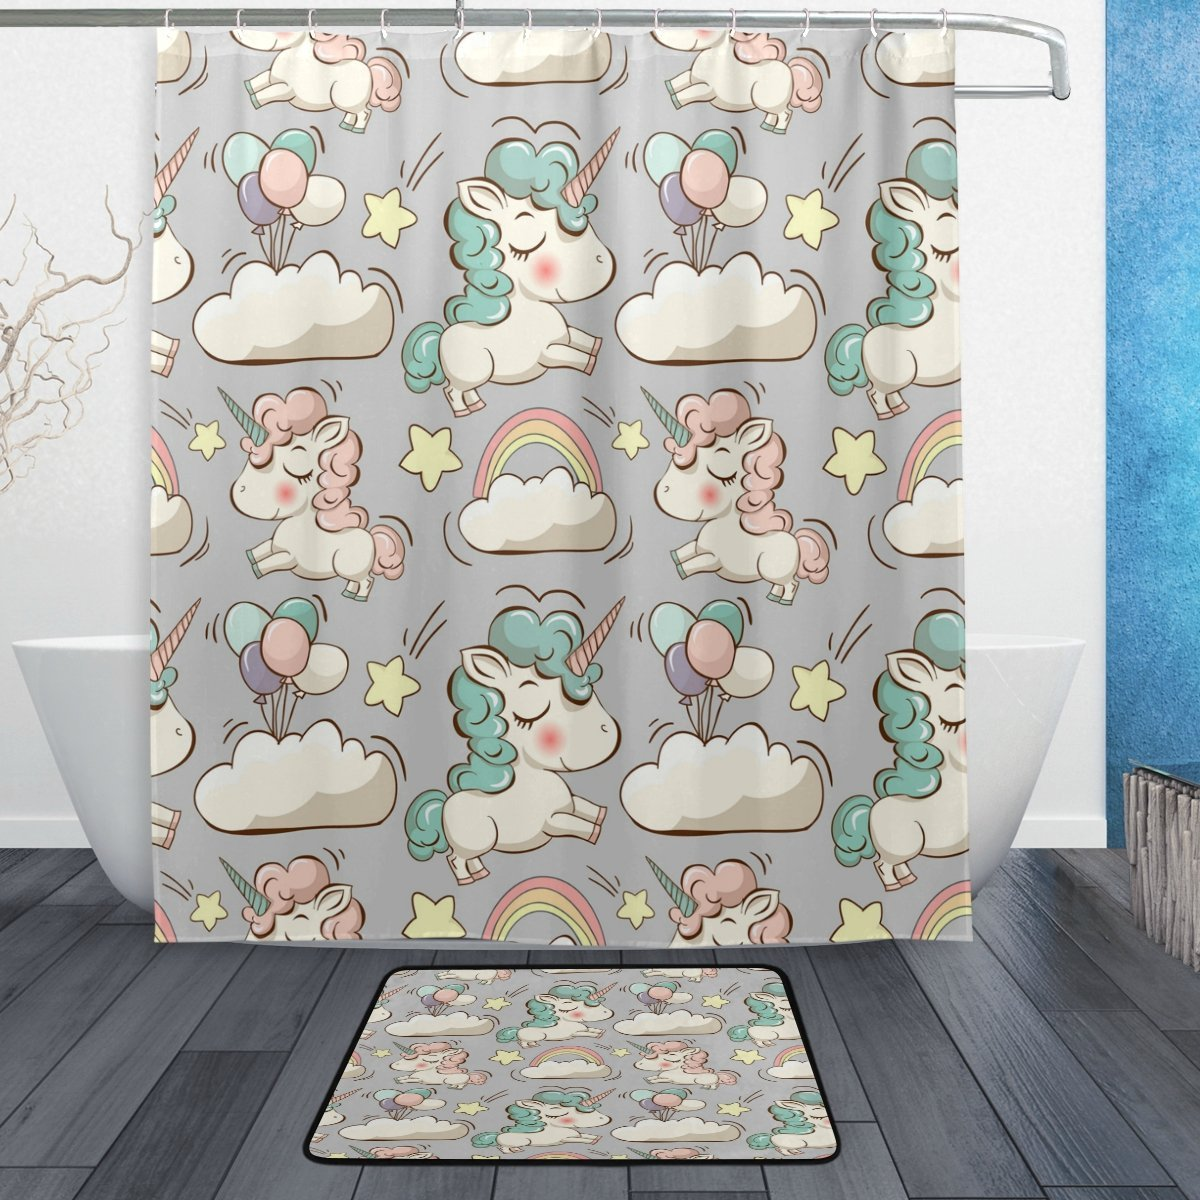 Cute Unicorn Cloud and Balloon Waterproof Polyester Fabric Shower Curtain with Hooks Doormat Bath Floor Mat Bathroom Home Decor